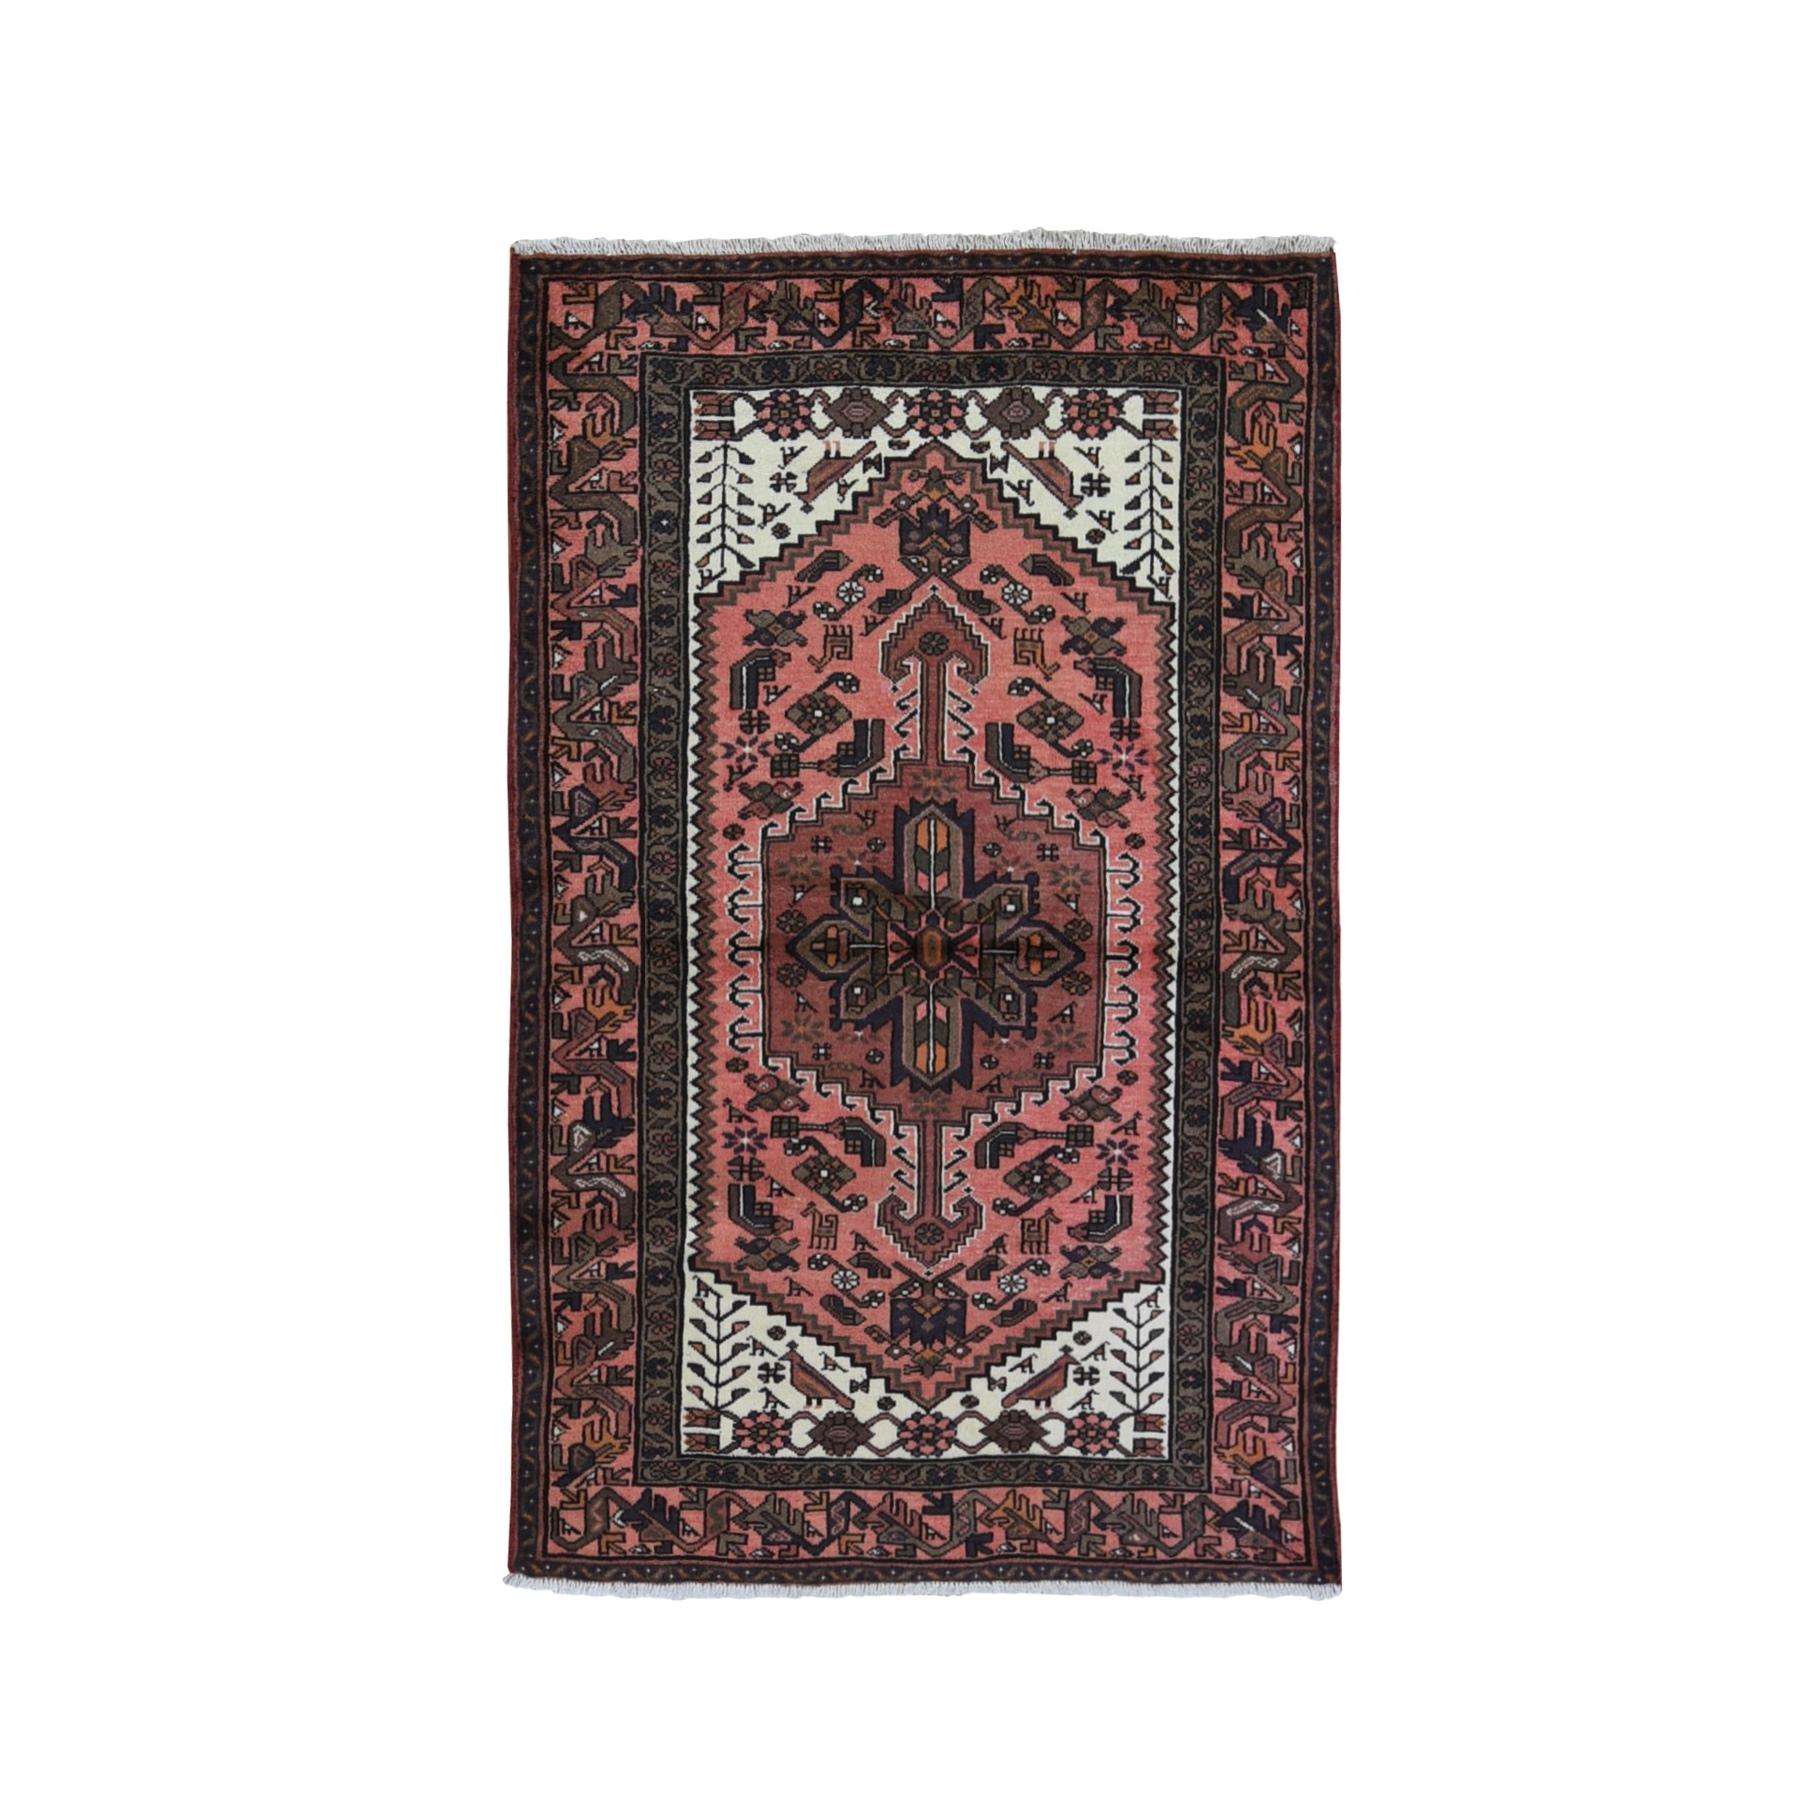 "4'x6'4"" New Persian Hamadan Birds and Animal Figurines Organic Wool Hand Knotted Oriental Rug"